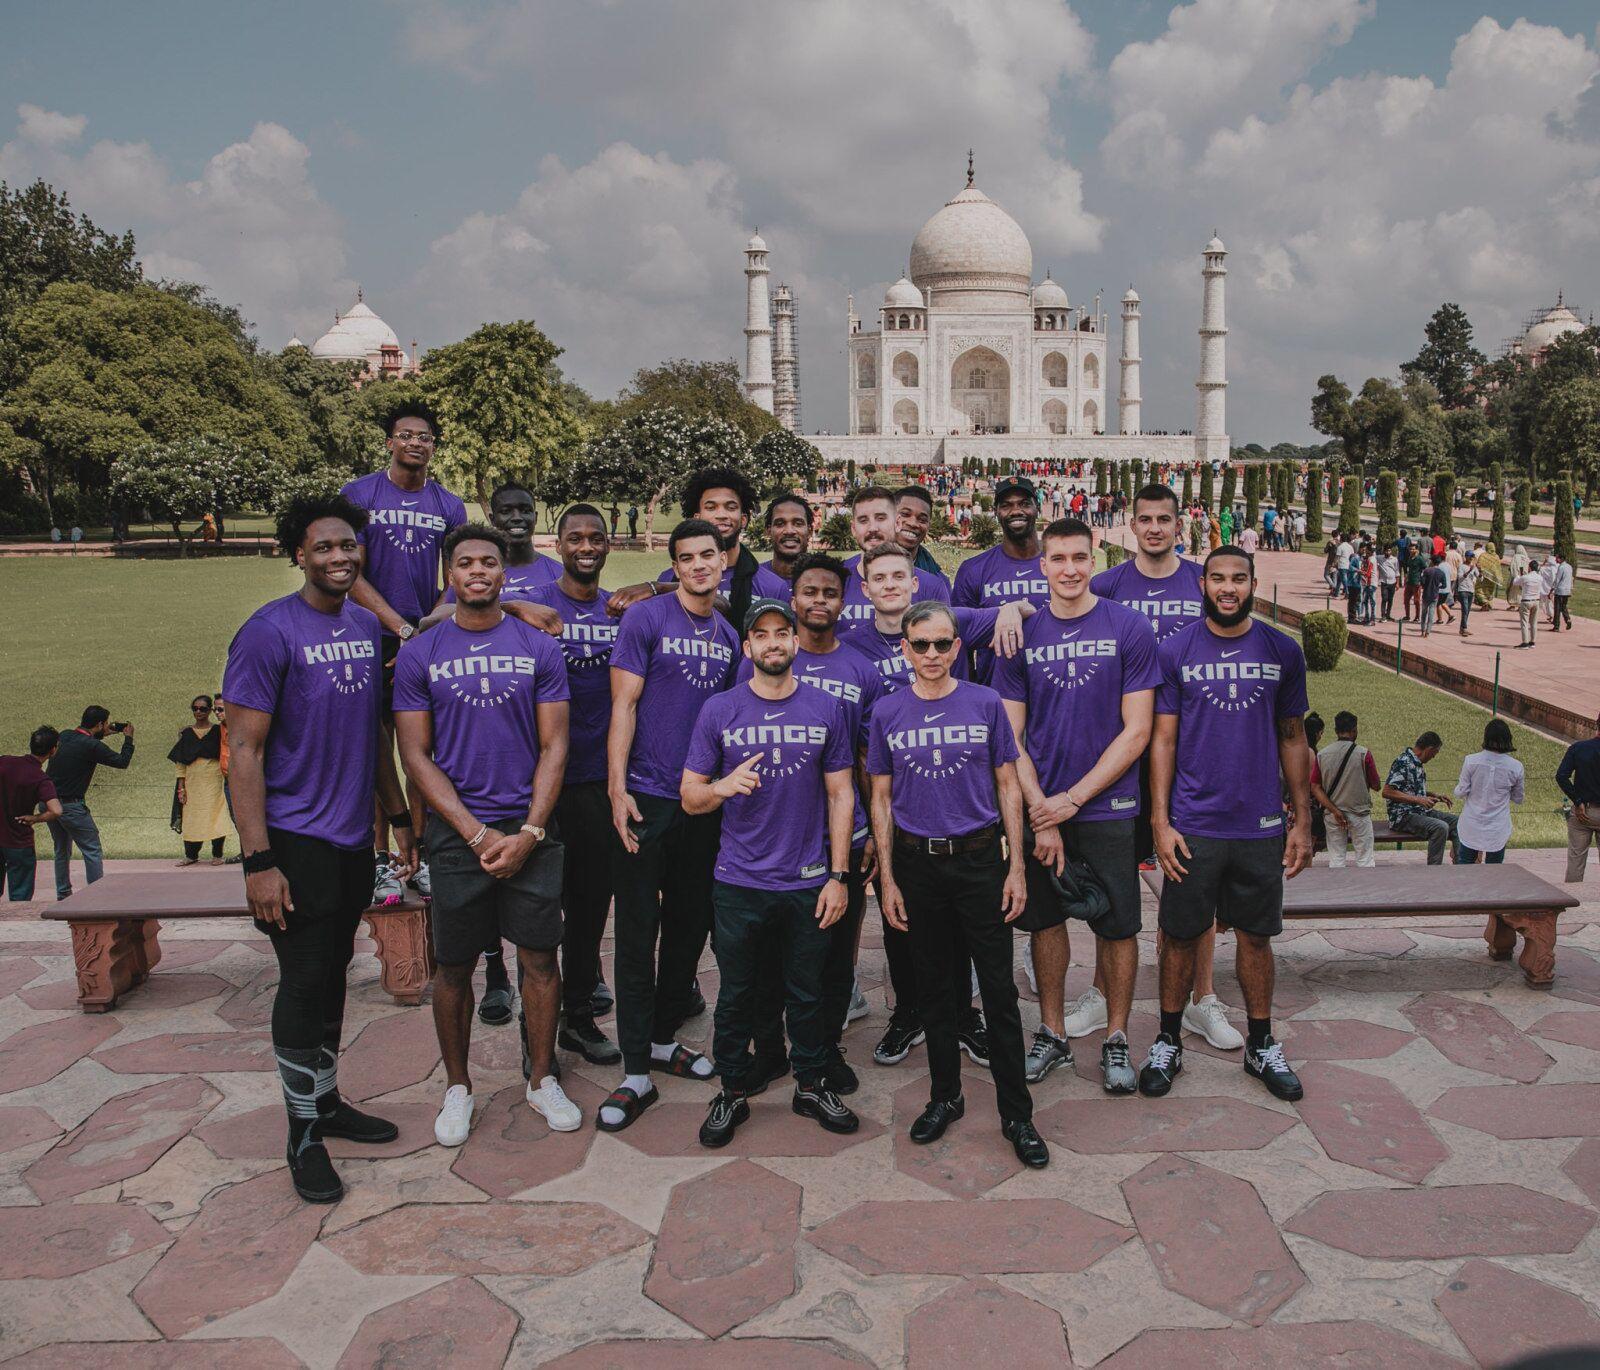 Sacramento Kings Make A Visit To India's Great Taj Mahal!